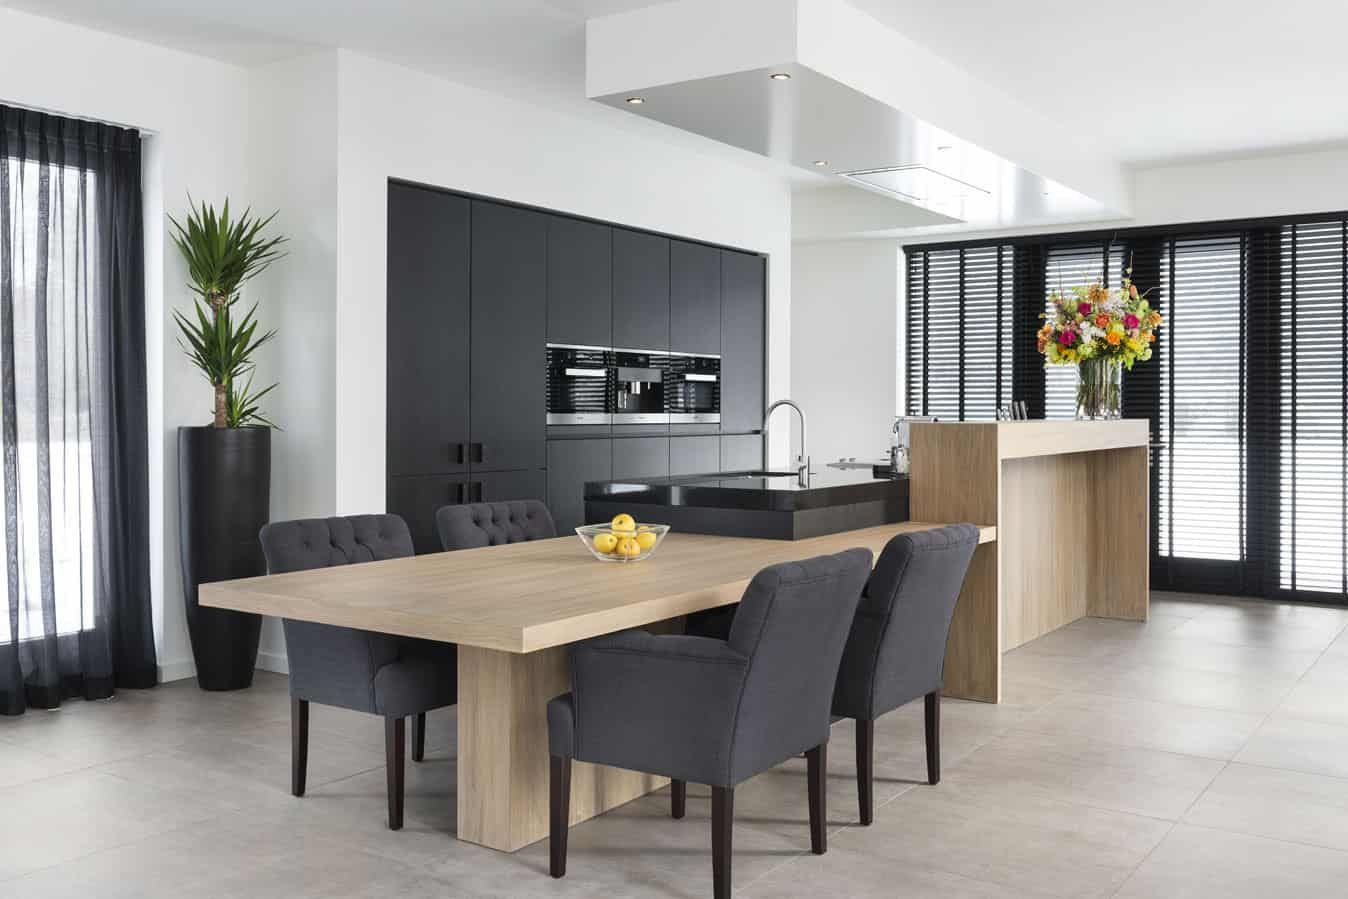 Keuken Bar Design : Moderne keuken met bar g bildepunkter lior family